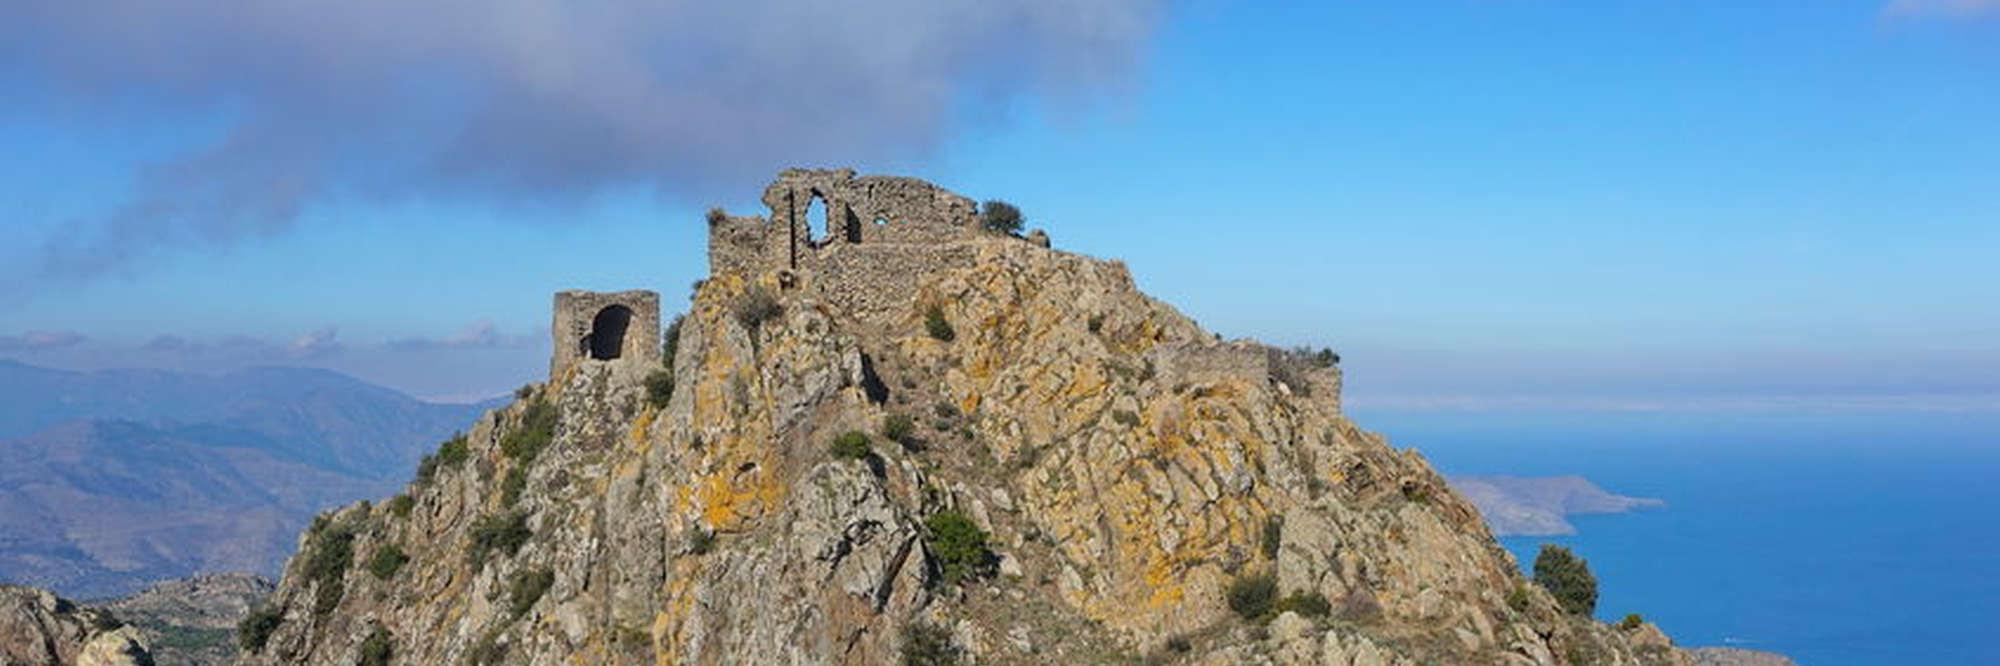 castle de verdera headerfoto